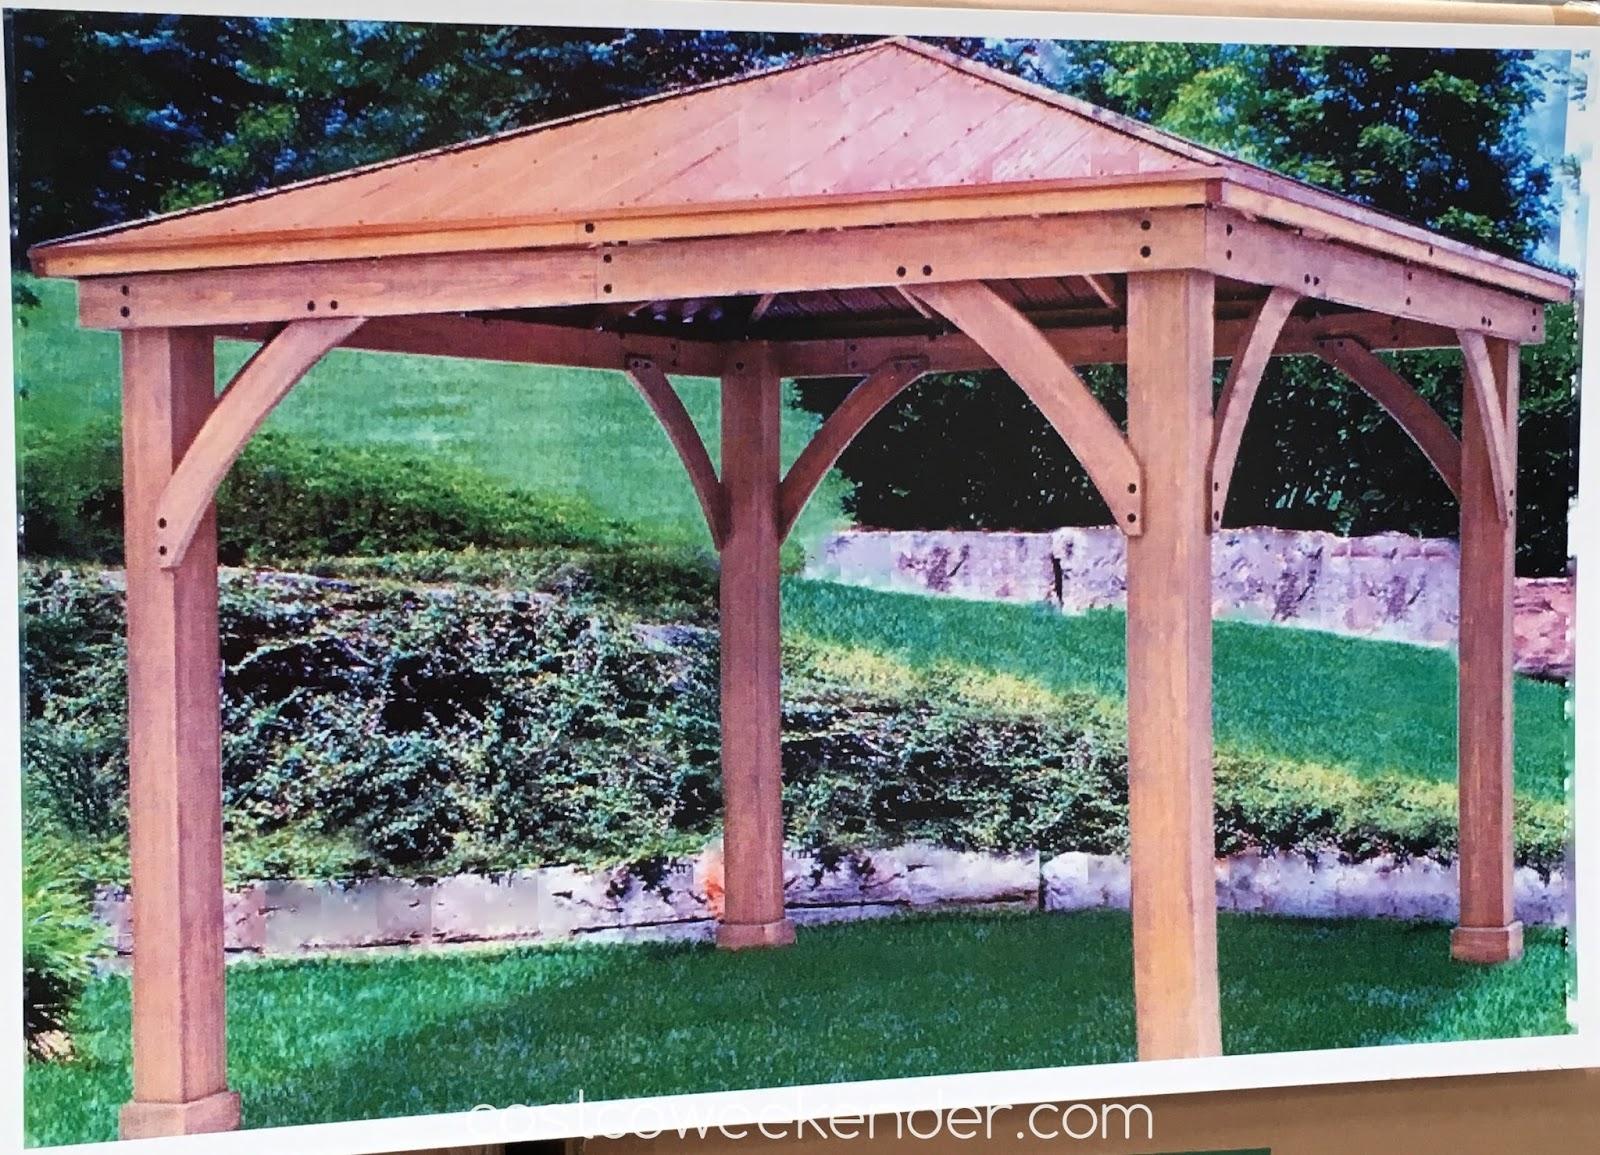 Yardistry 12' x 12' Wood Gazebo with Aluminum Roof ... on Yardistry Backyard Pavilion id=60681